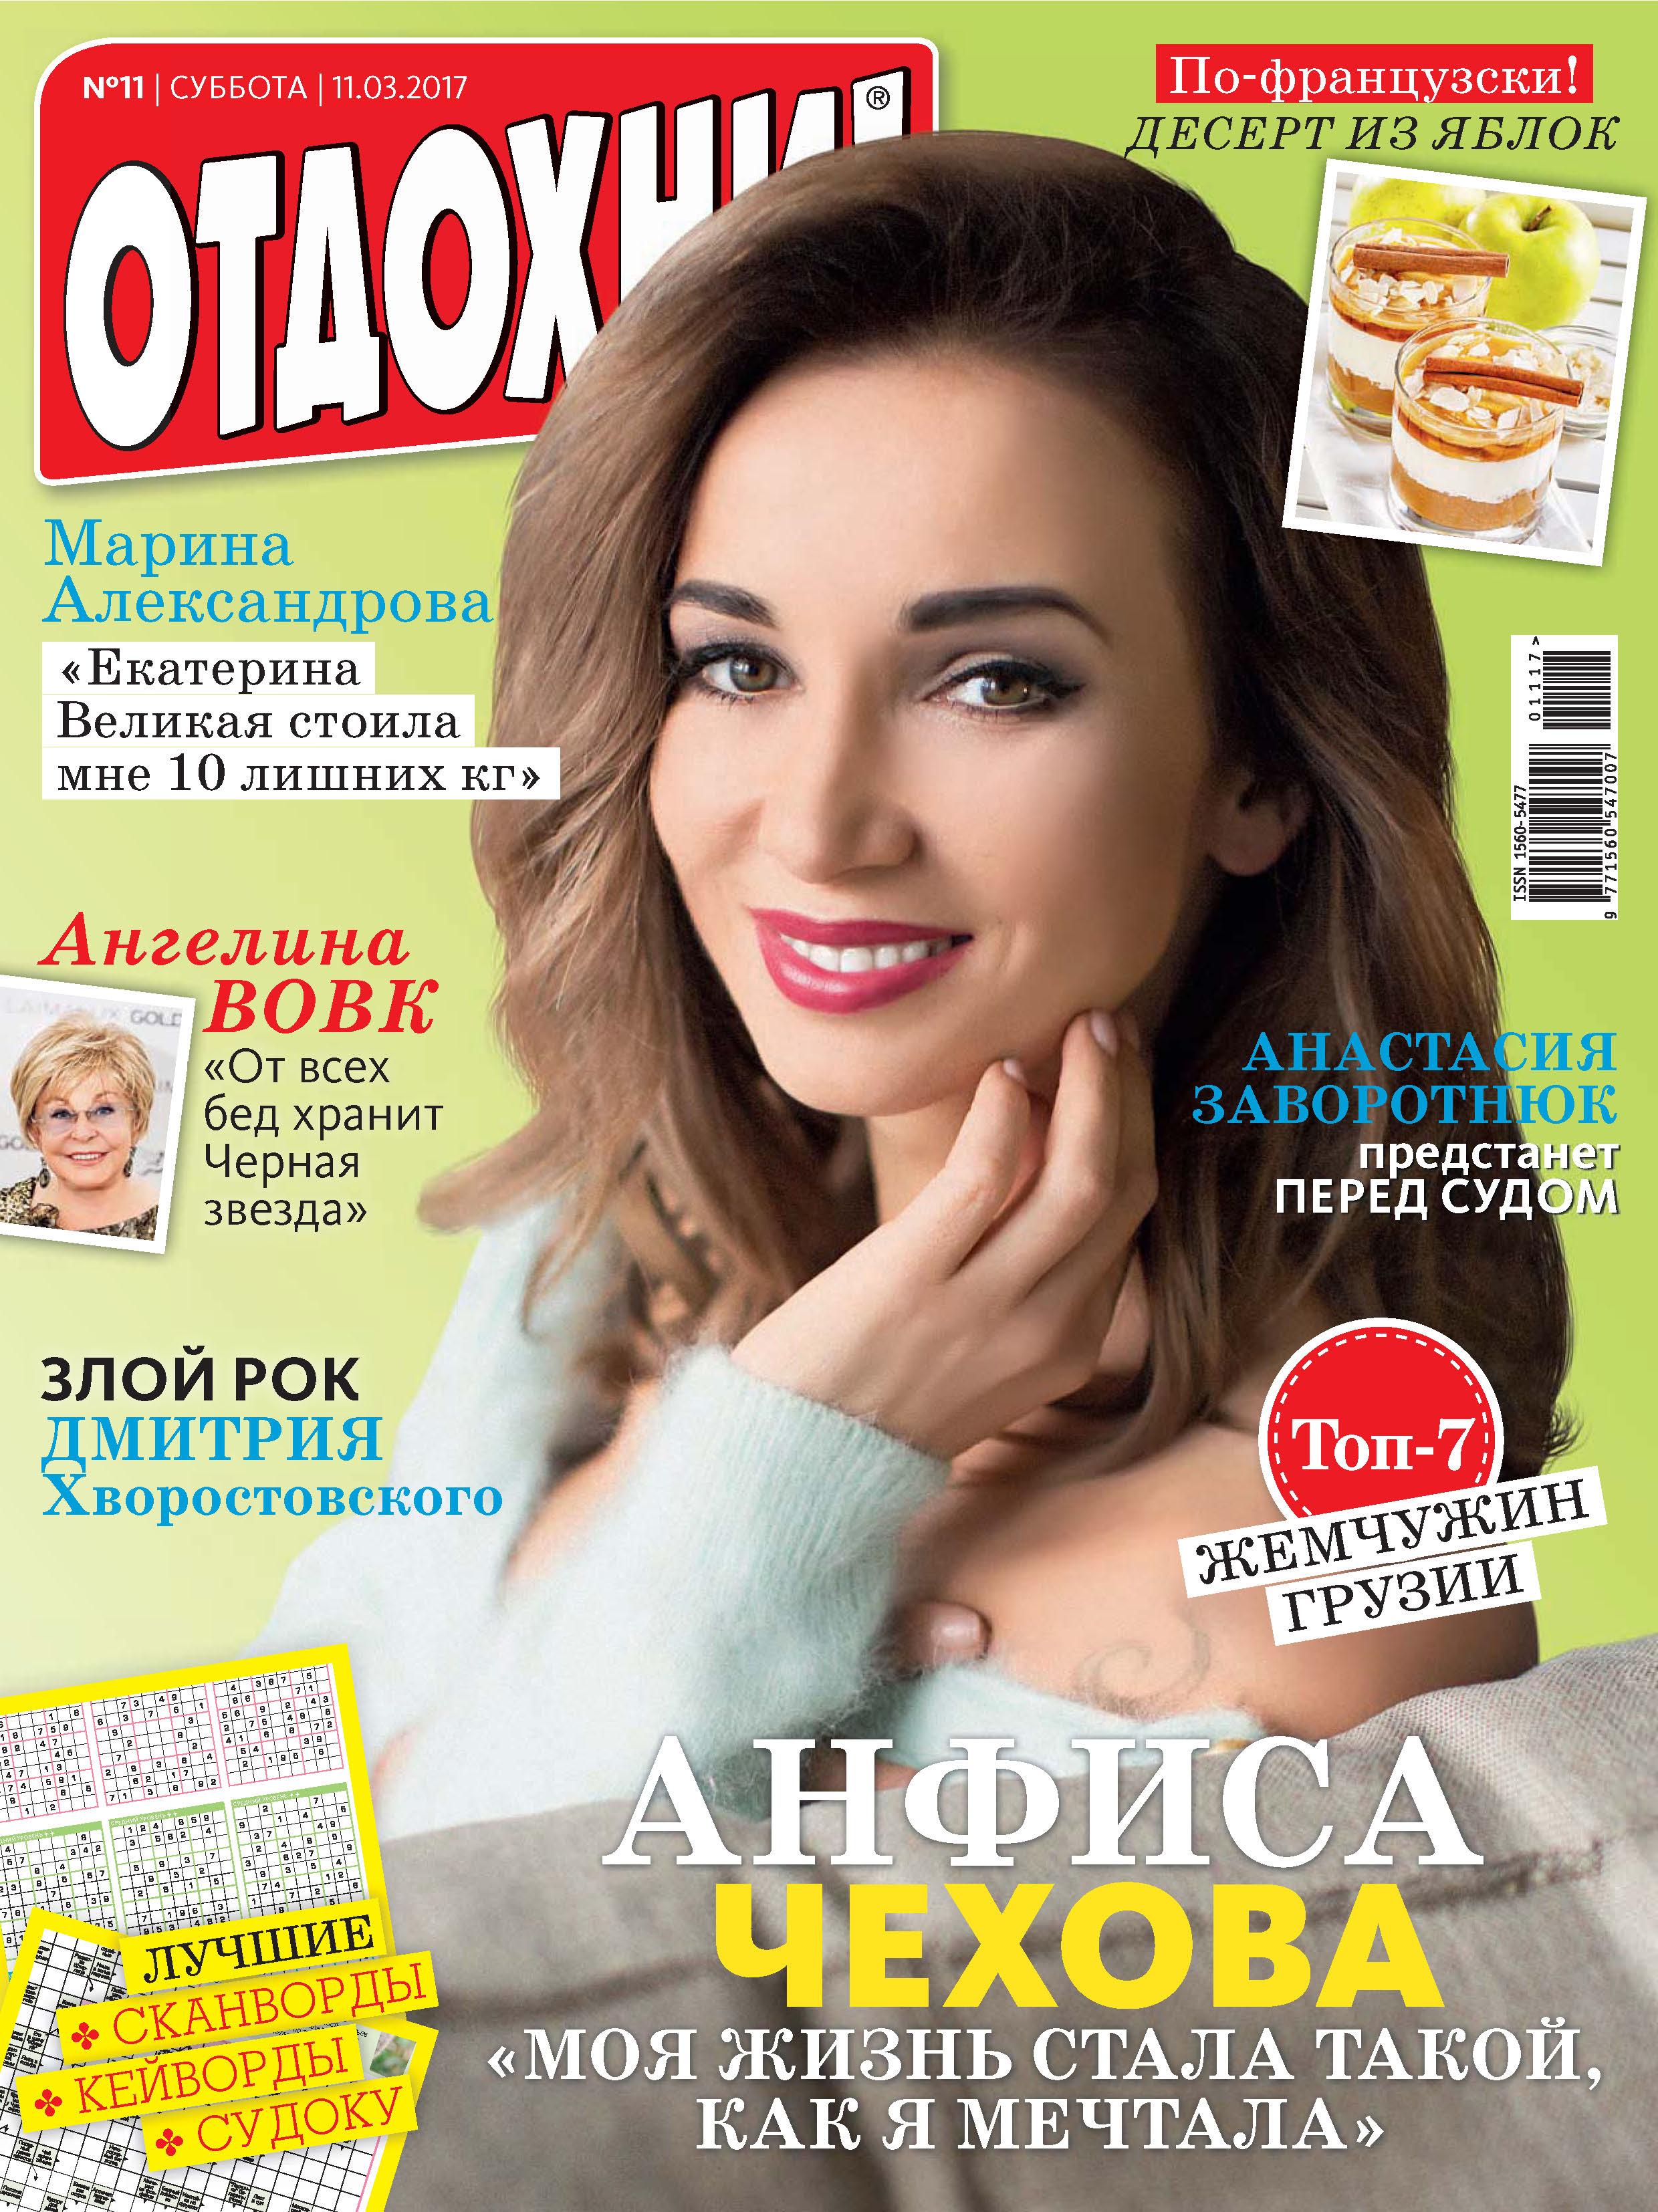 ИД «Бурда» Журнал «Отдохни!» №11/2017 ид бурда журнал отдохни 12 2017